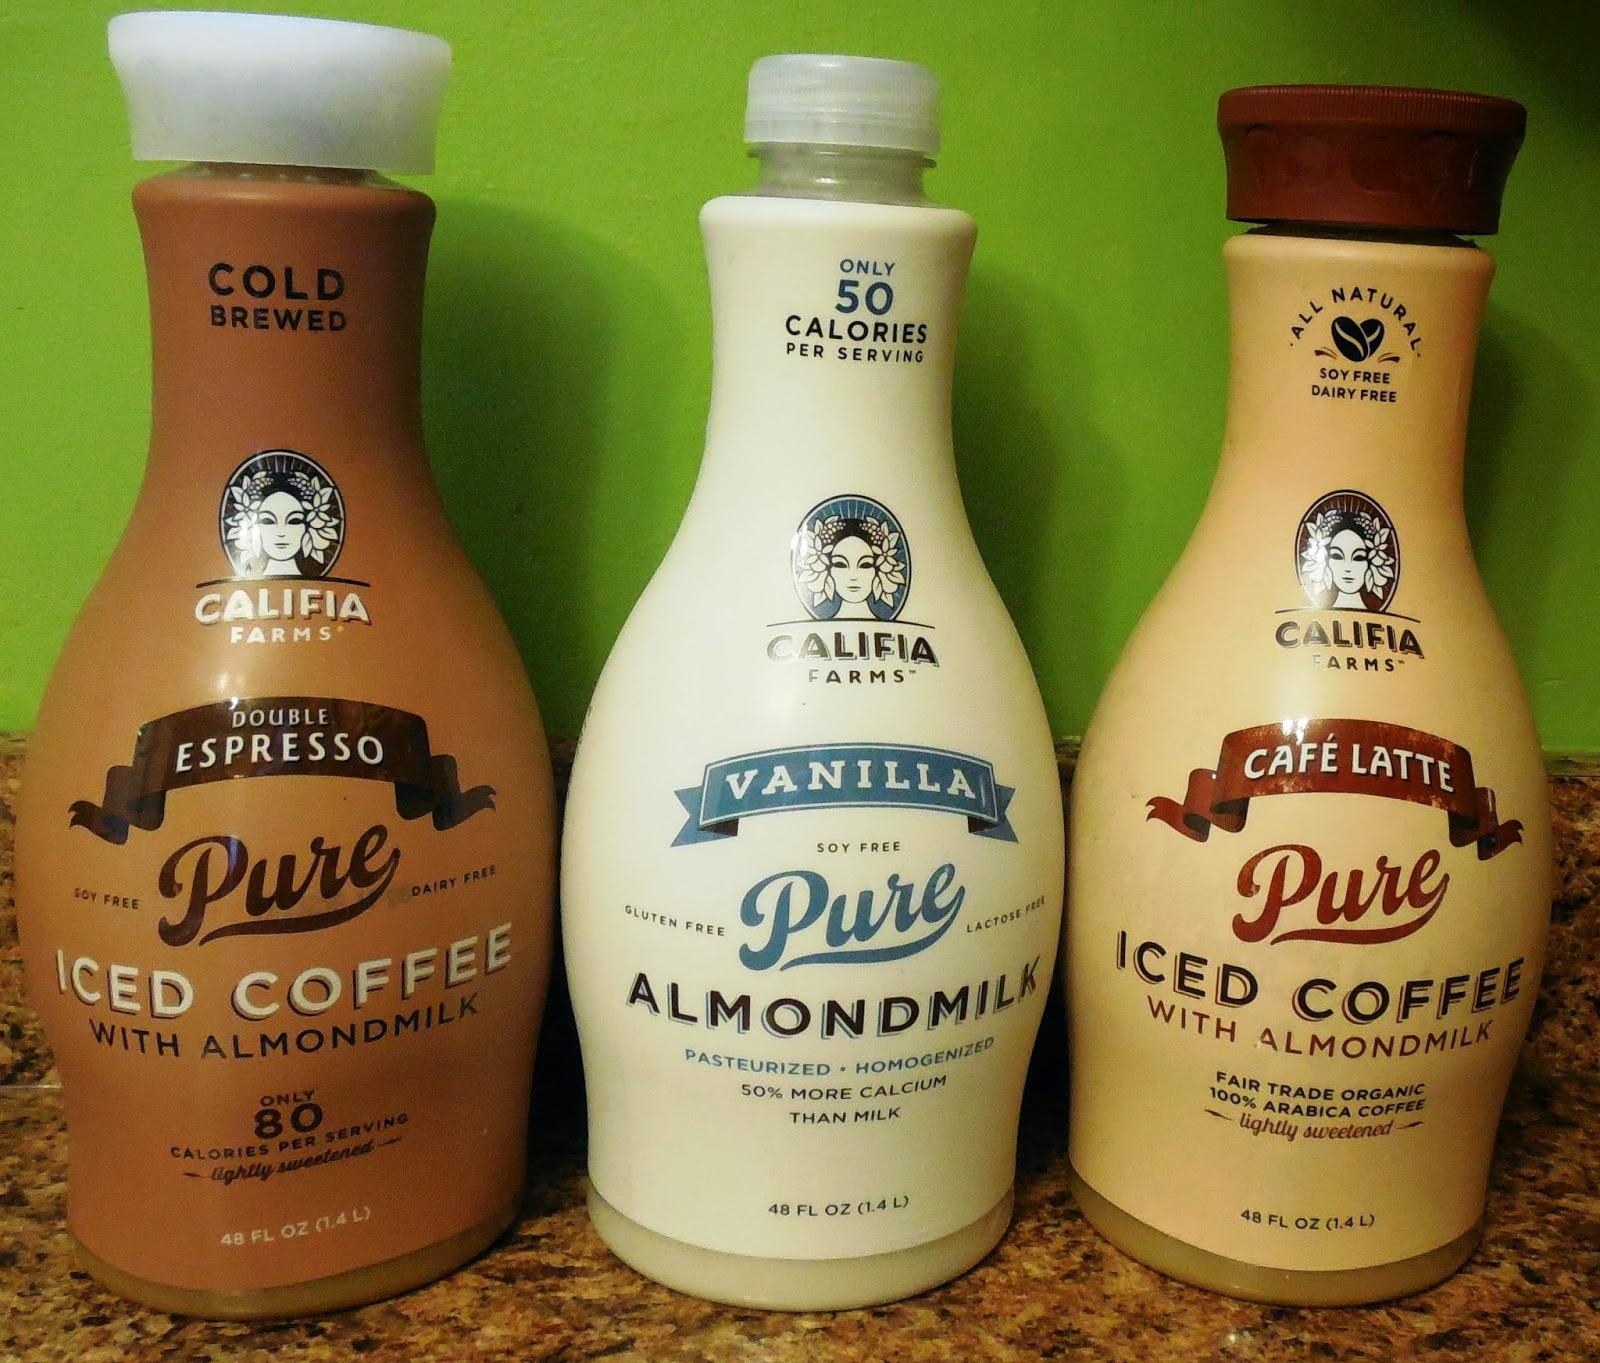 califia farms almond milk review